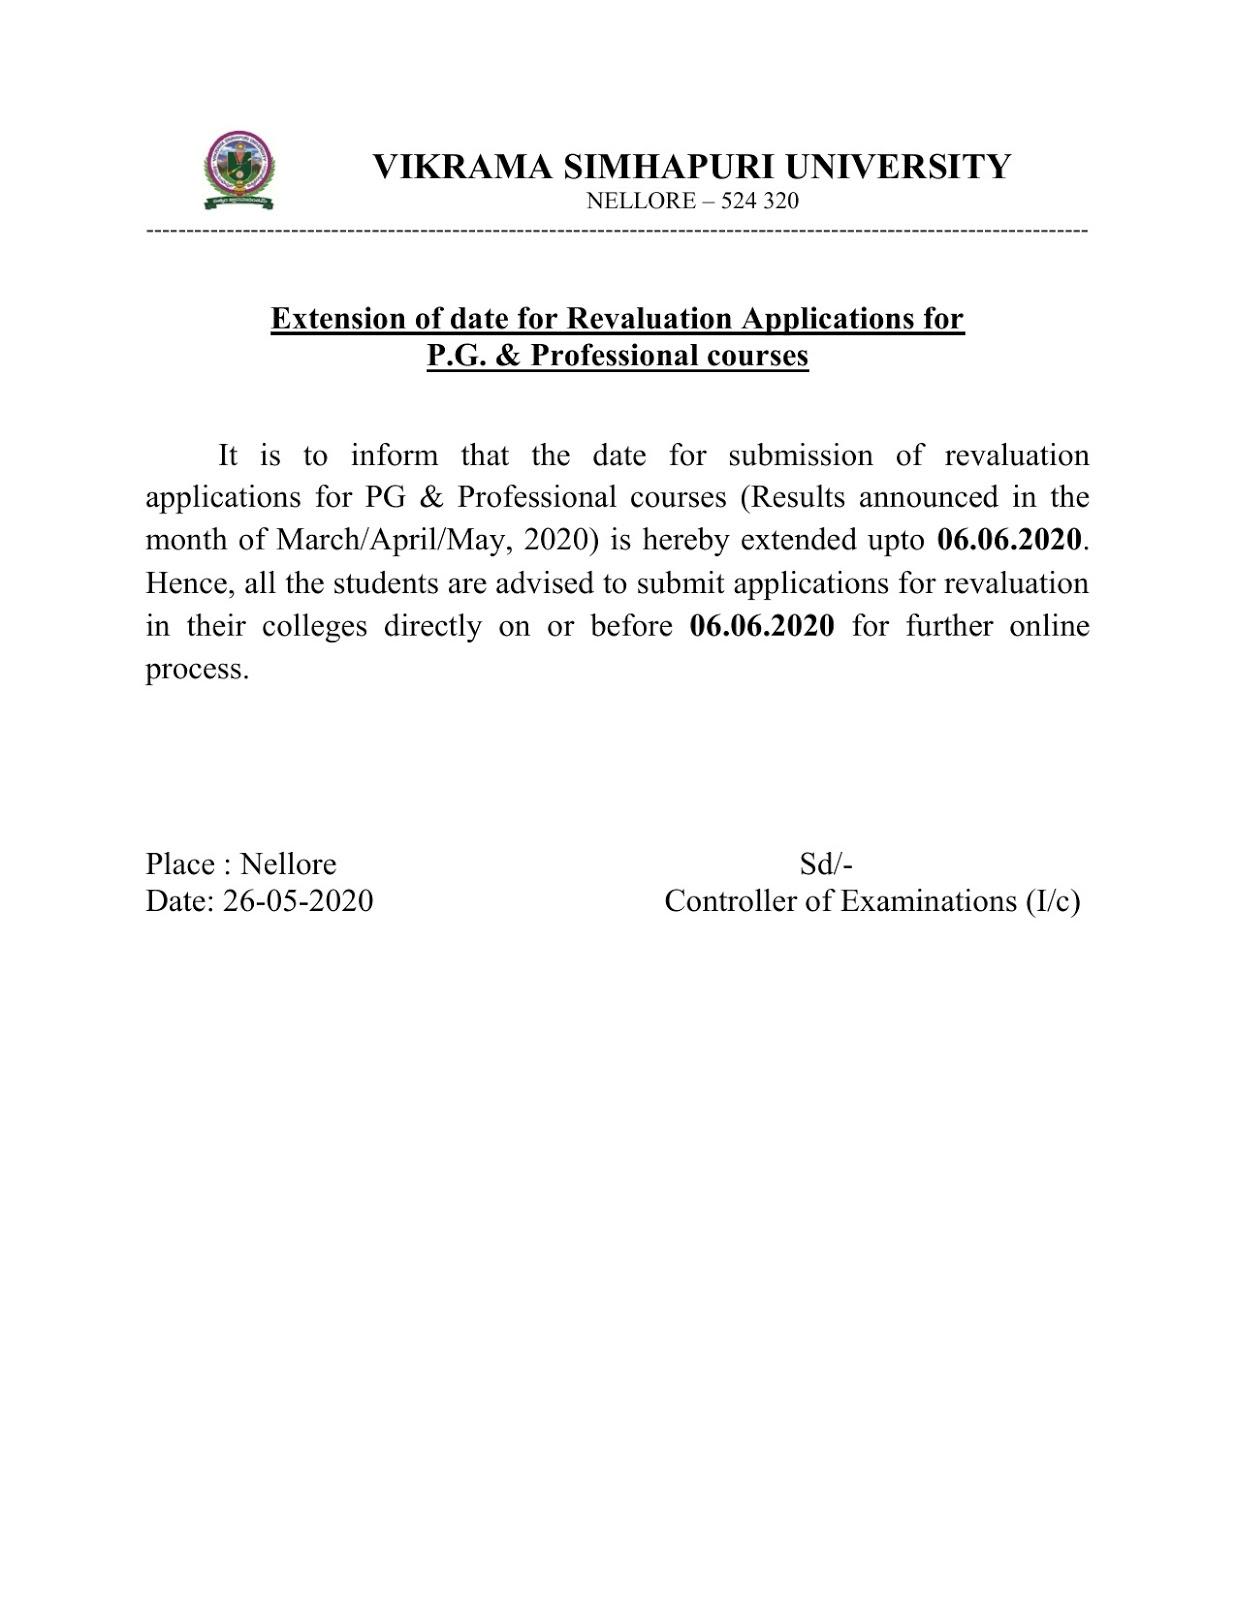 Vikrama Simhapuri University PG & Prof courses Rev Applications Date Extended